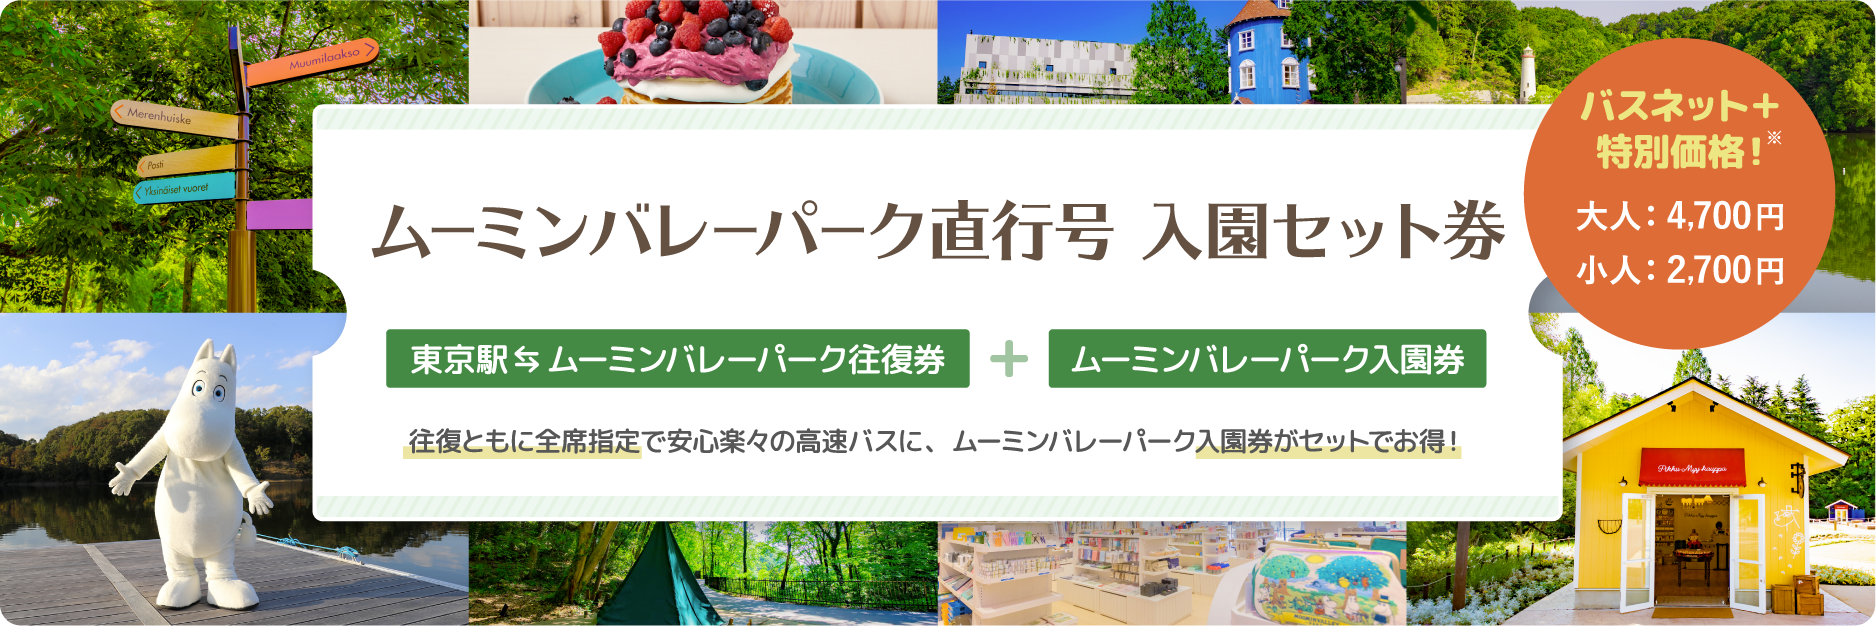 Moomin Valley park going straight admission set ticket Bus net + special price Adult 4,700 yen Child 2,700 yen